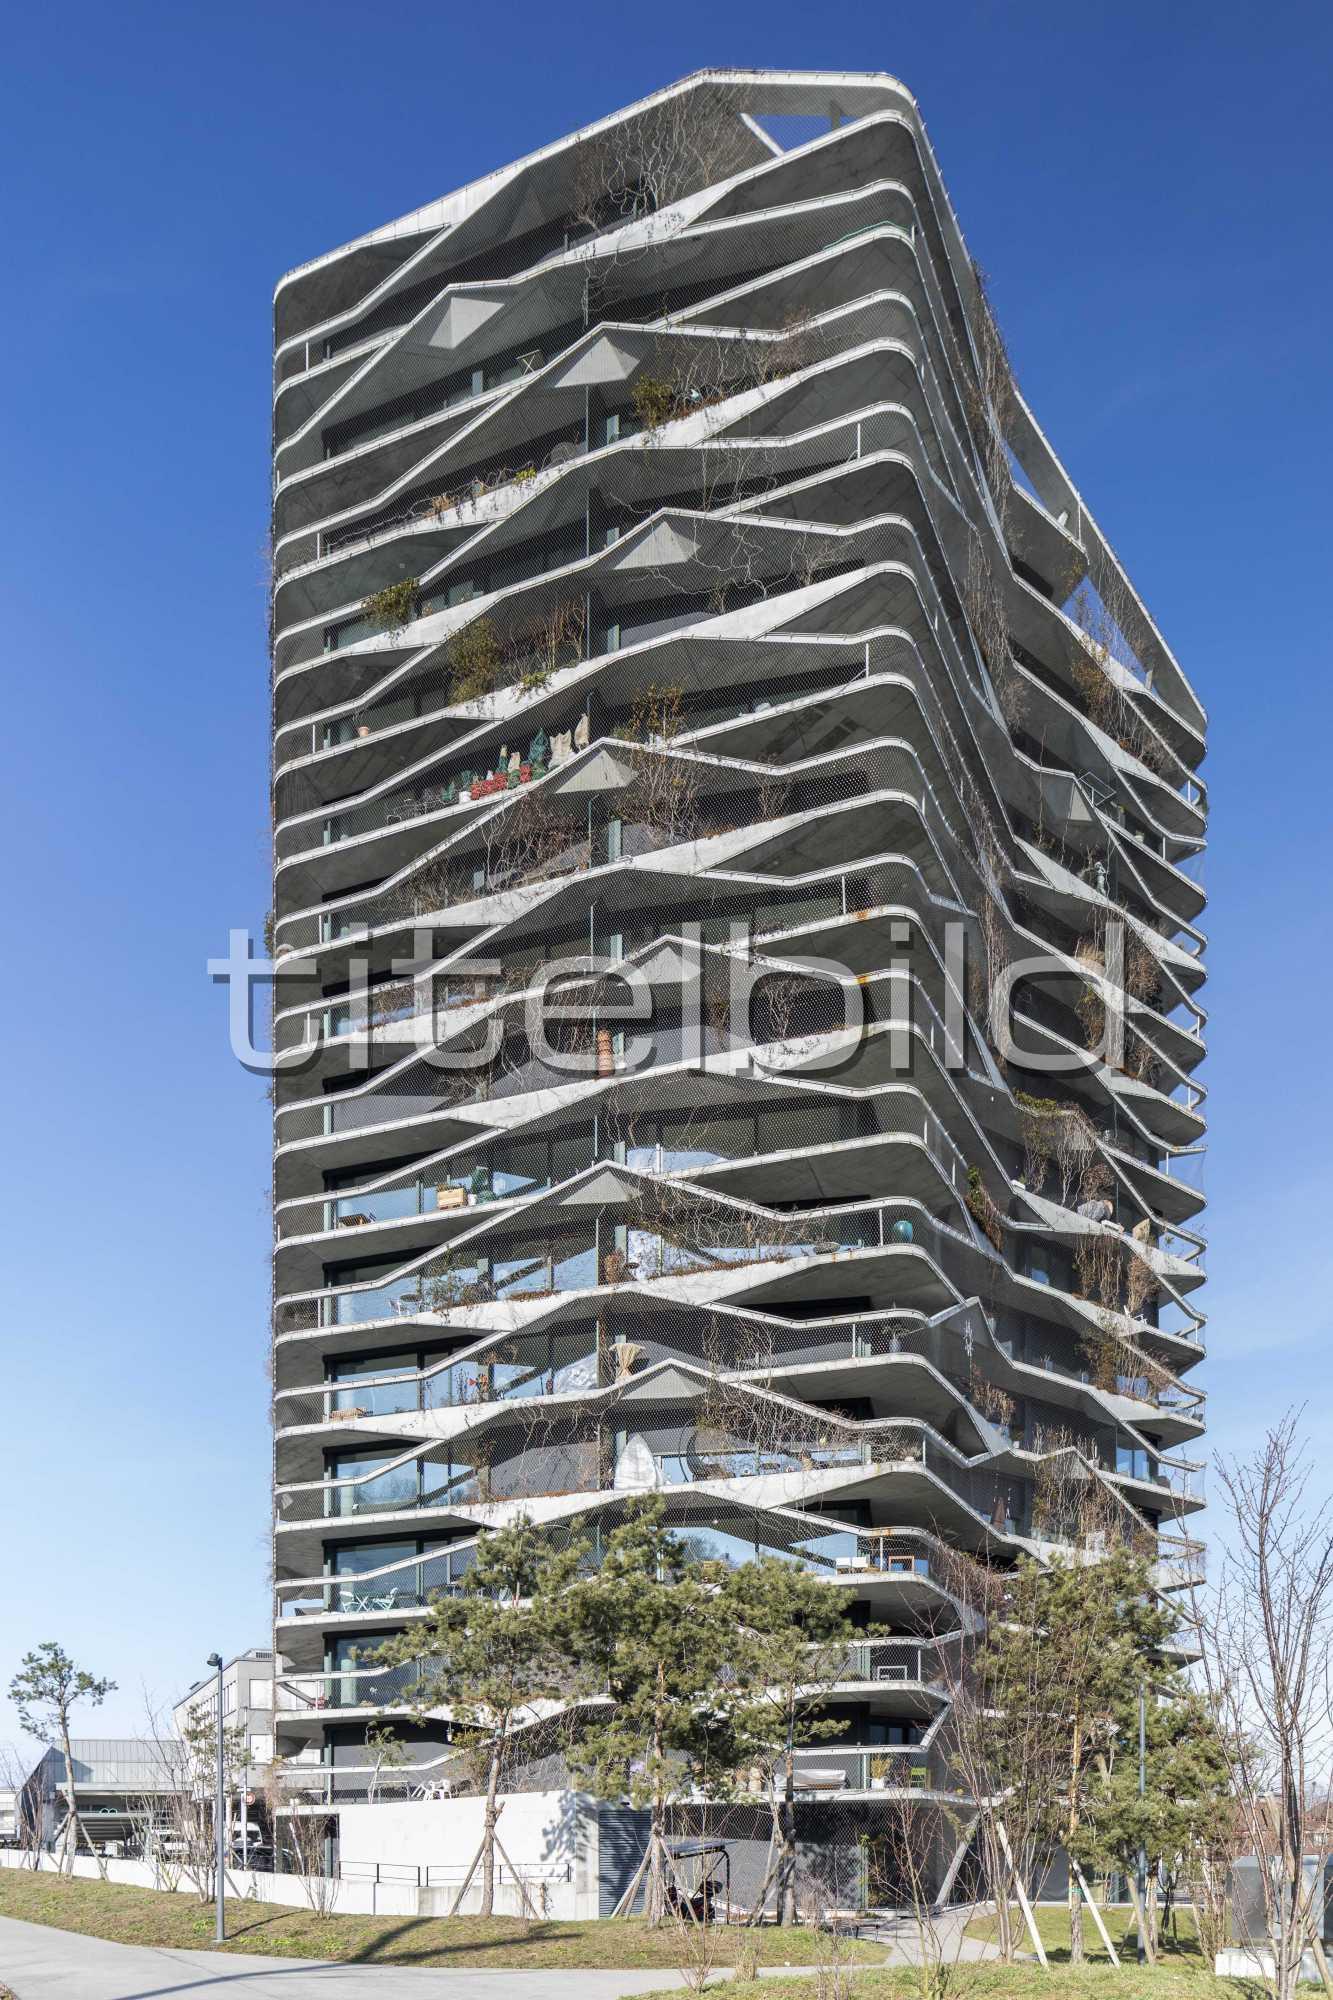 Projektbild-Nr. 1: Garden Tower Bächtelenpark Wabern